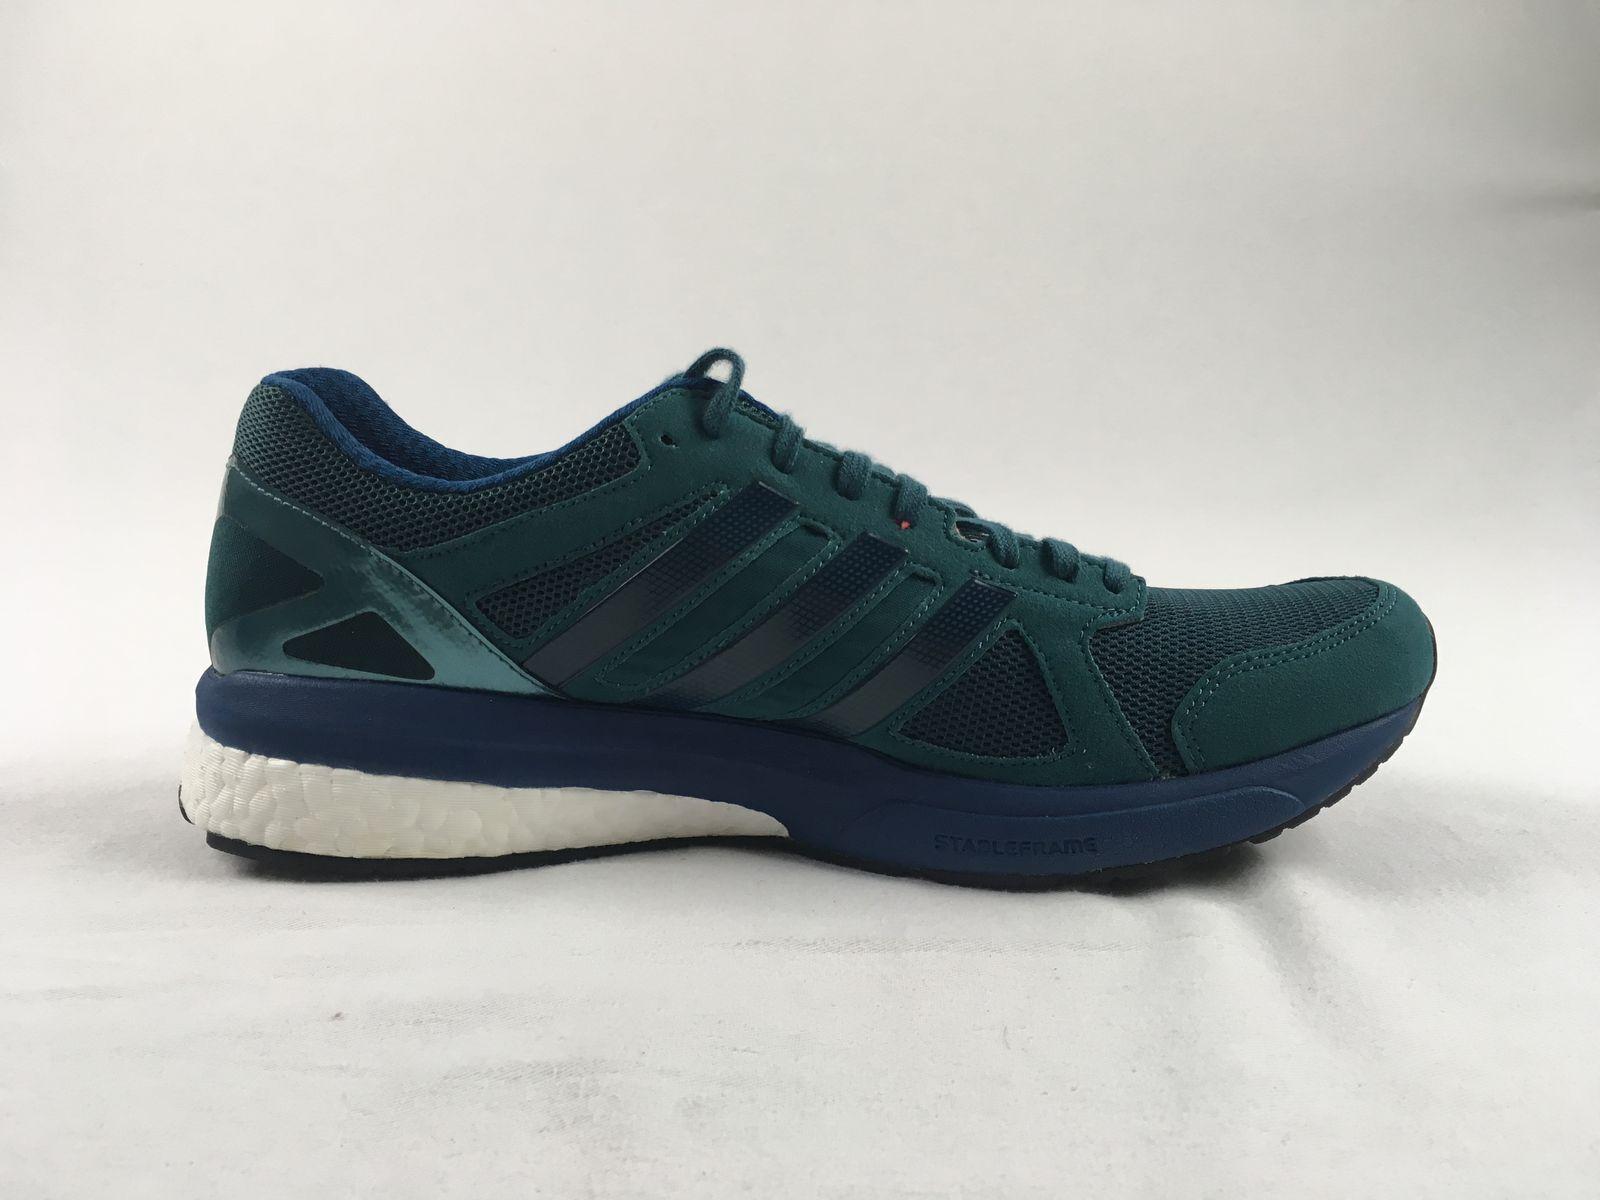 NEW adidas adizero Tempo 8 - Green bluee Running, Cross Training (Men's 10)